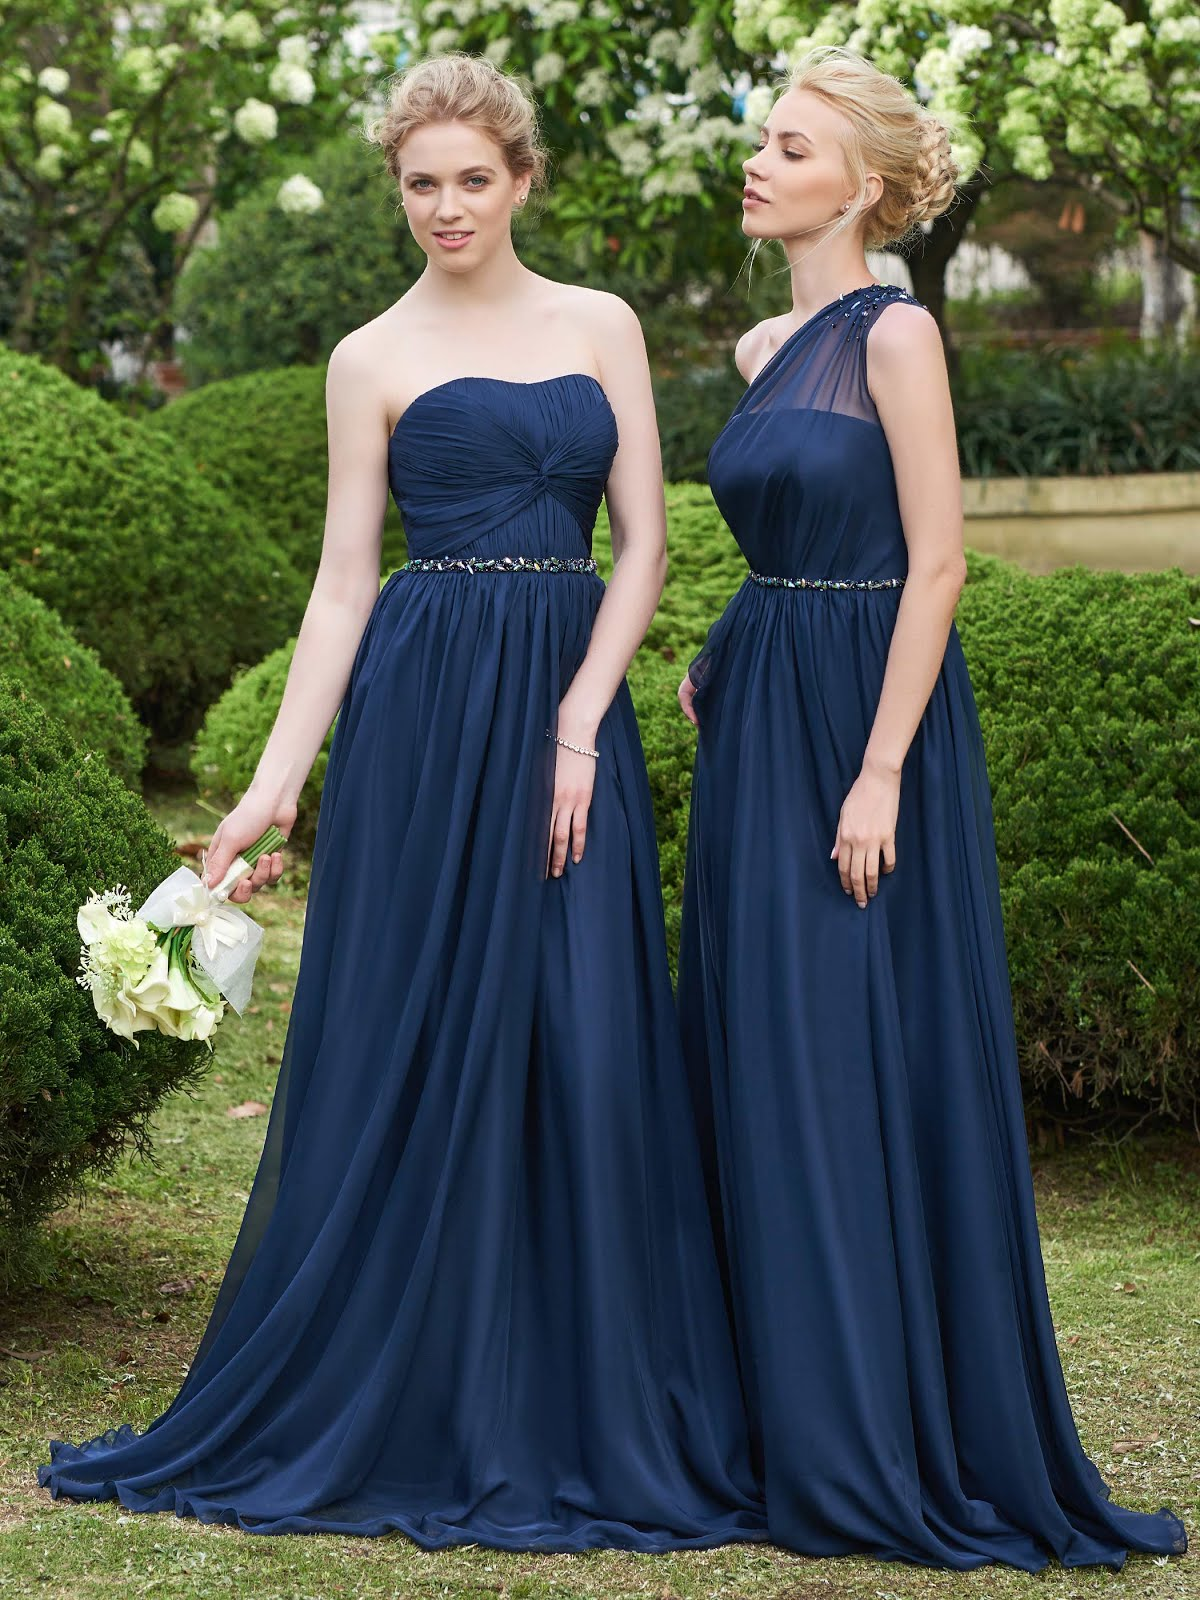 Spring Formal Sleeveless One Shoulder Crystal Summer All Sizes Natural Dress